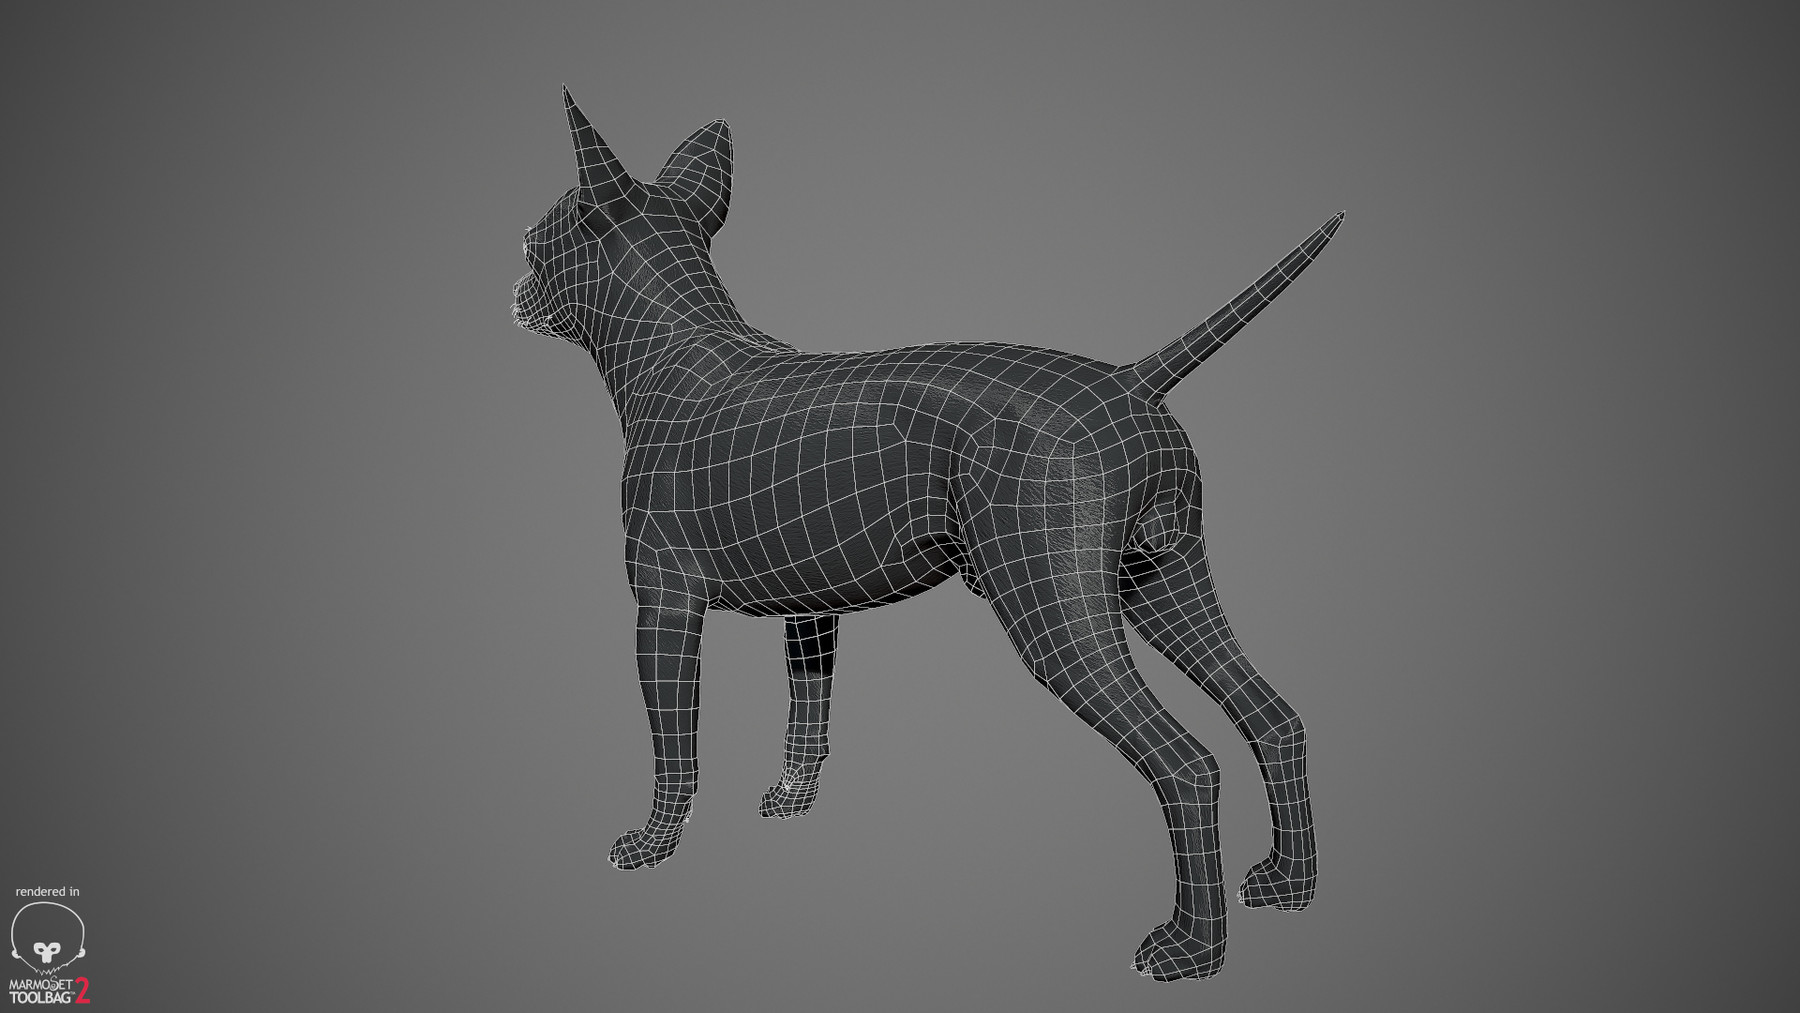 Chihuahua by alexlashko wireframe 02